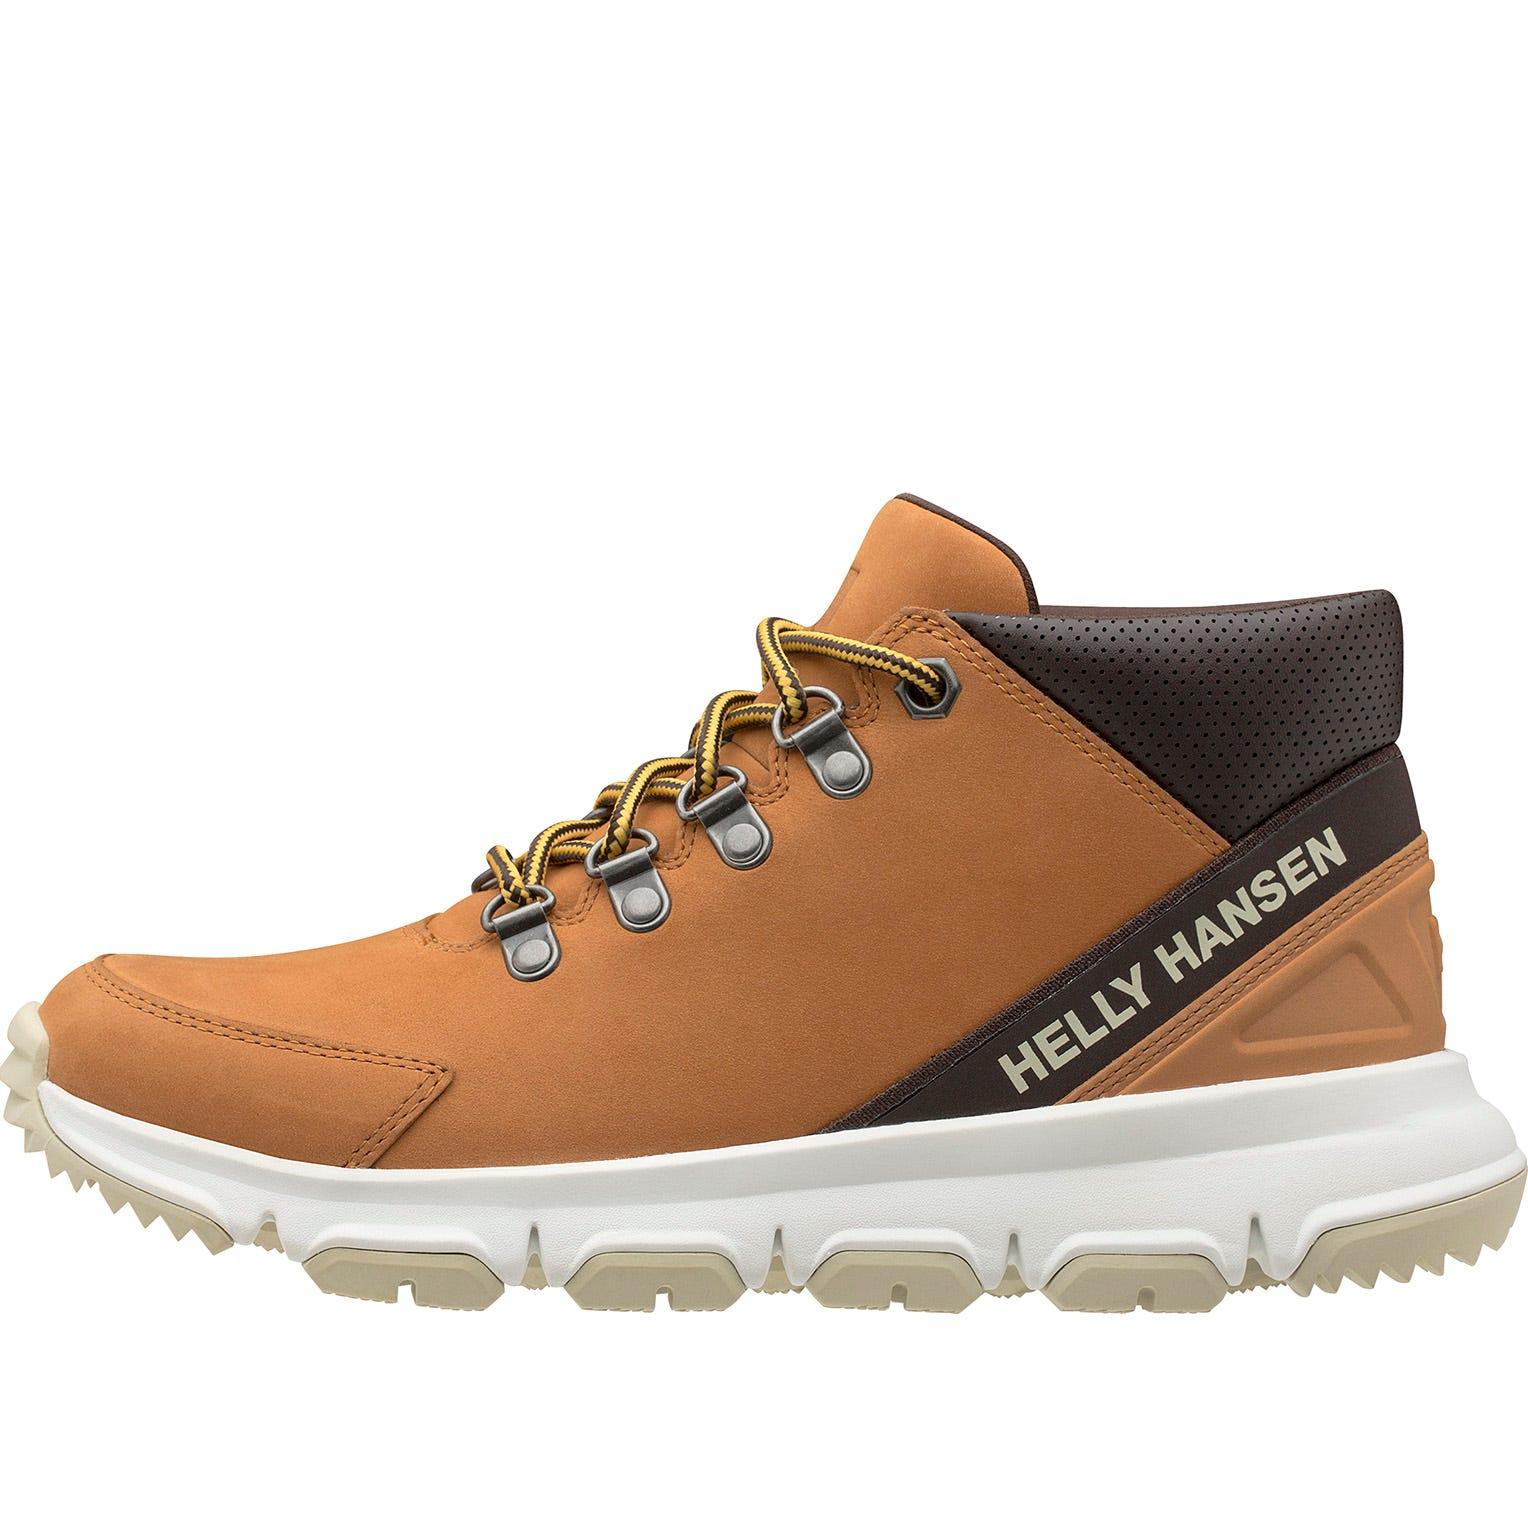 Helly Hansen W Fendvard Boot Womens Casual Shoe Brown 8.5